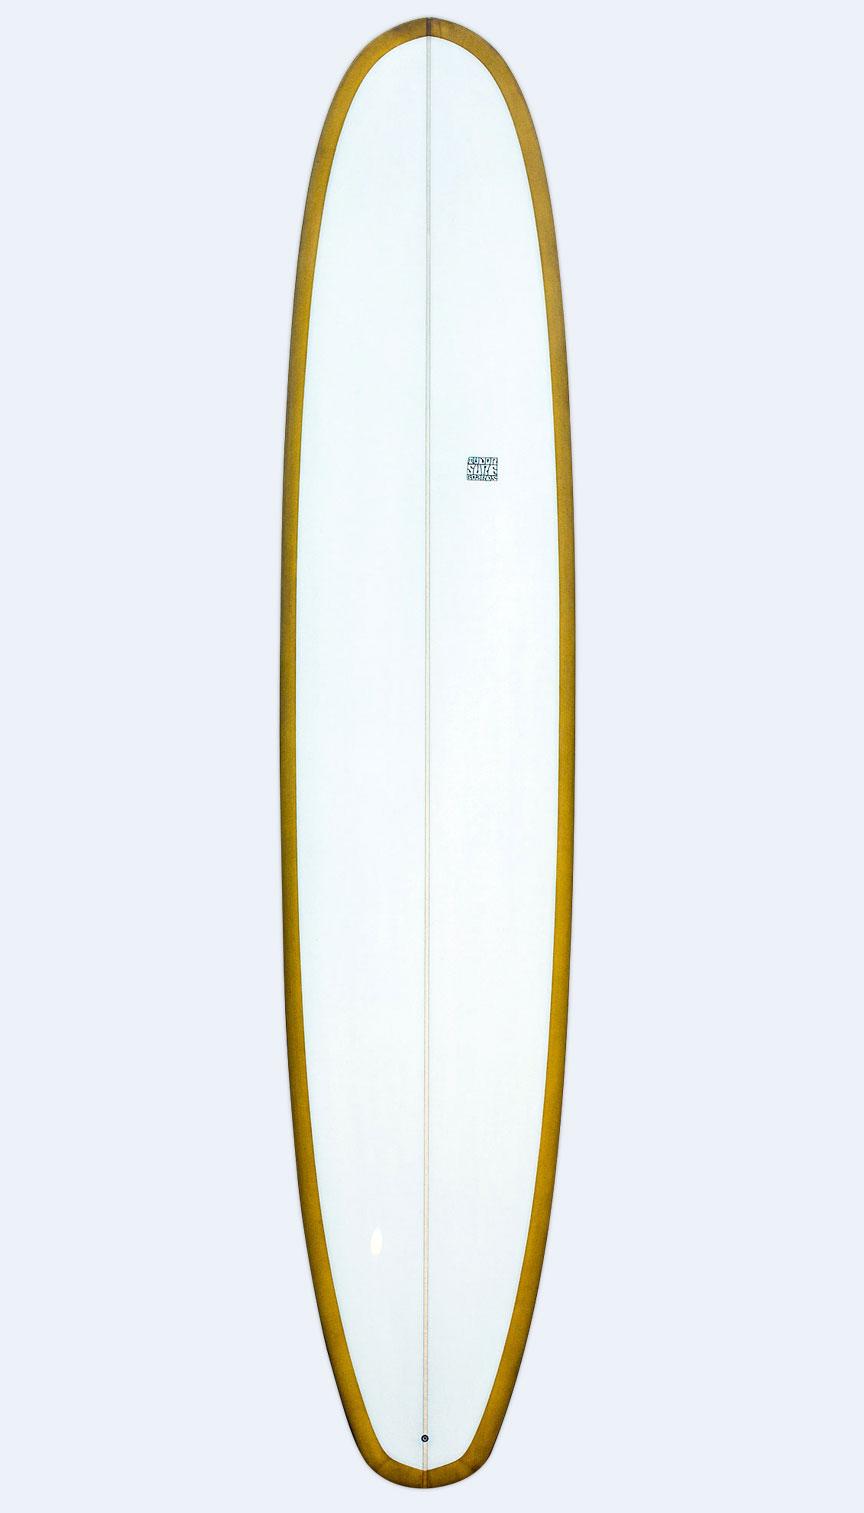 tudor-surfboards-dtail